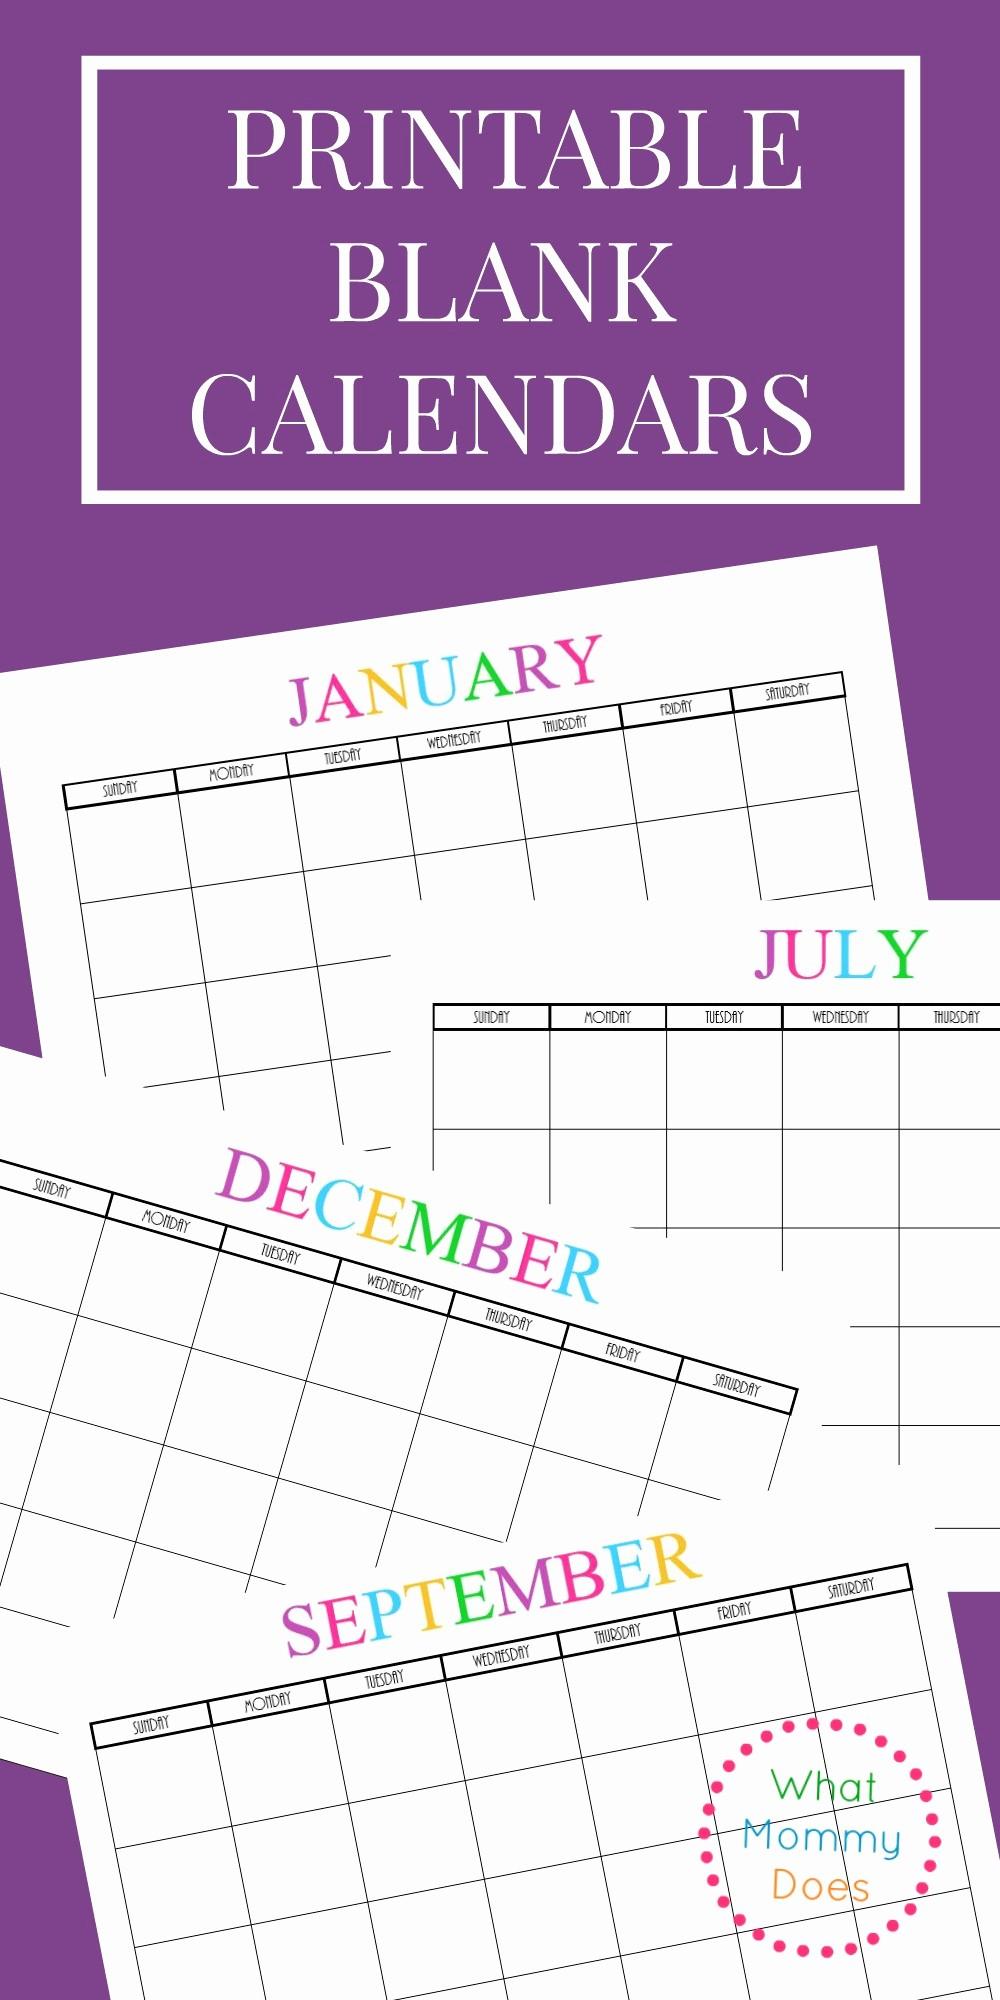 2017-2018 Blank Calendar Beautiful Free Printable Blank Monthly Calendars 2017 2018 2019